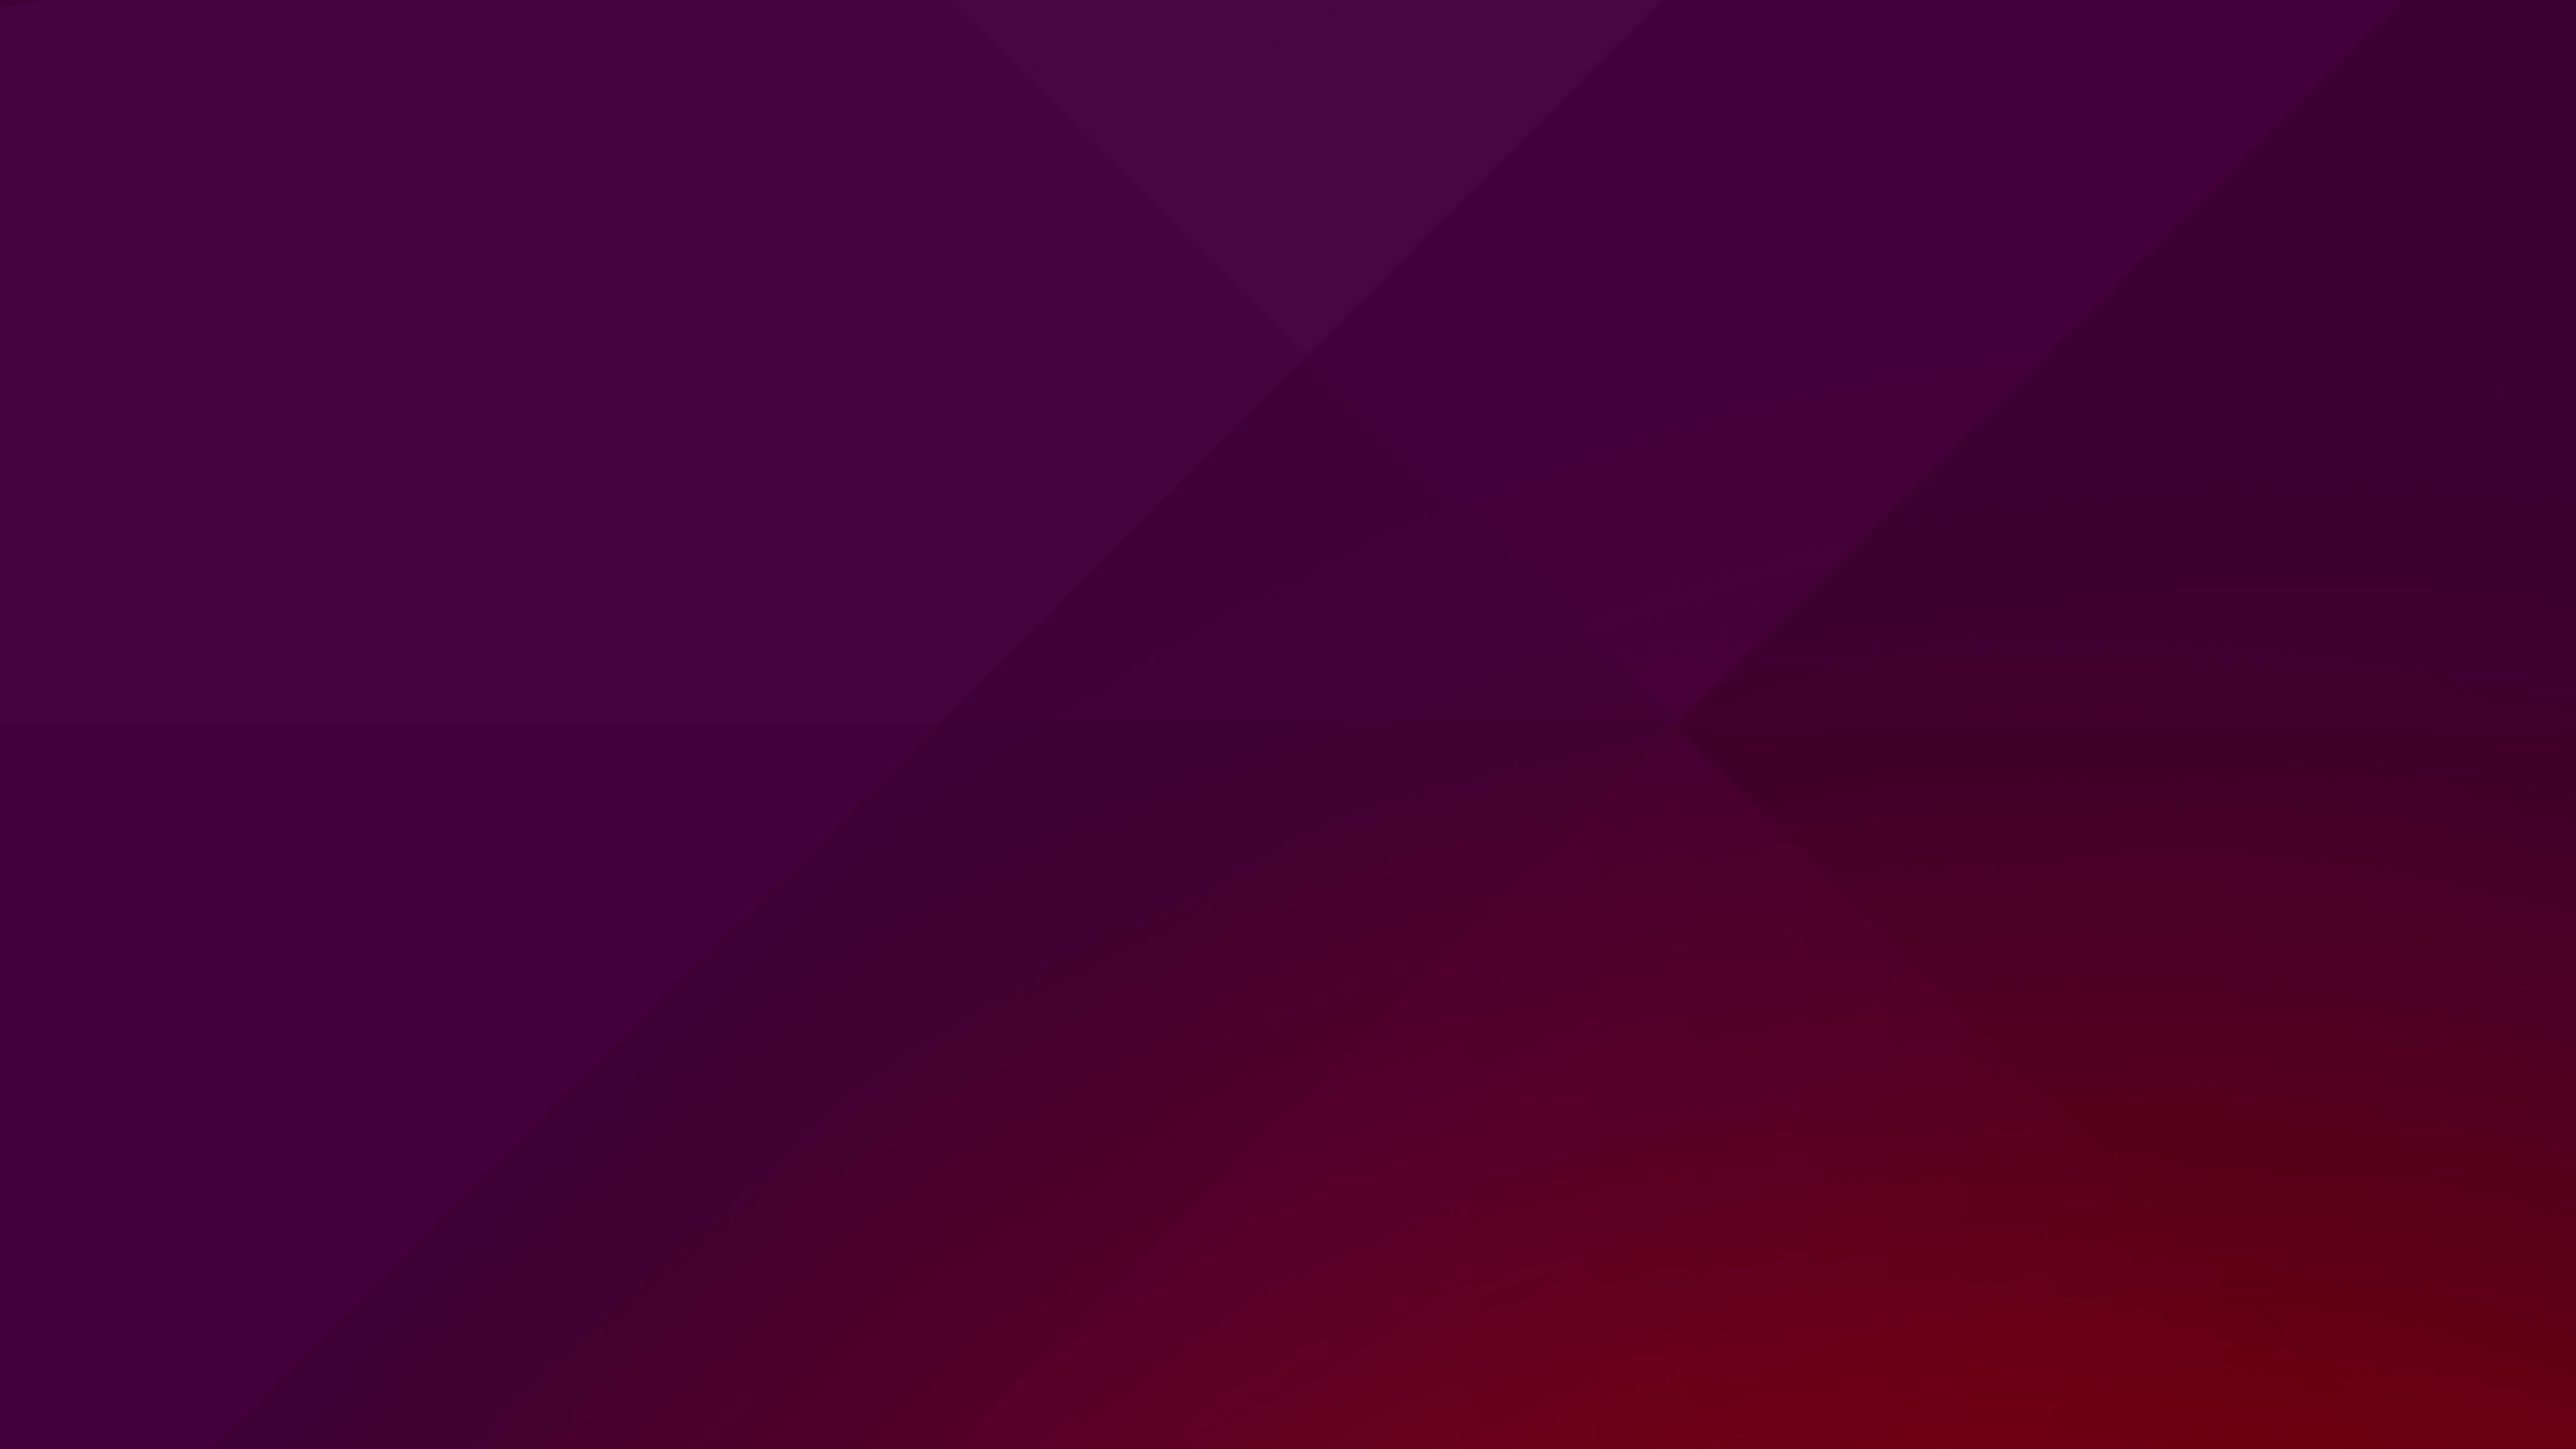 New Ubuntu 1510 Default Wallpaper Revealed 4096x2304